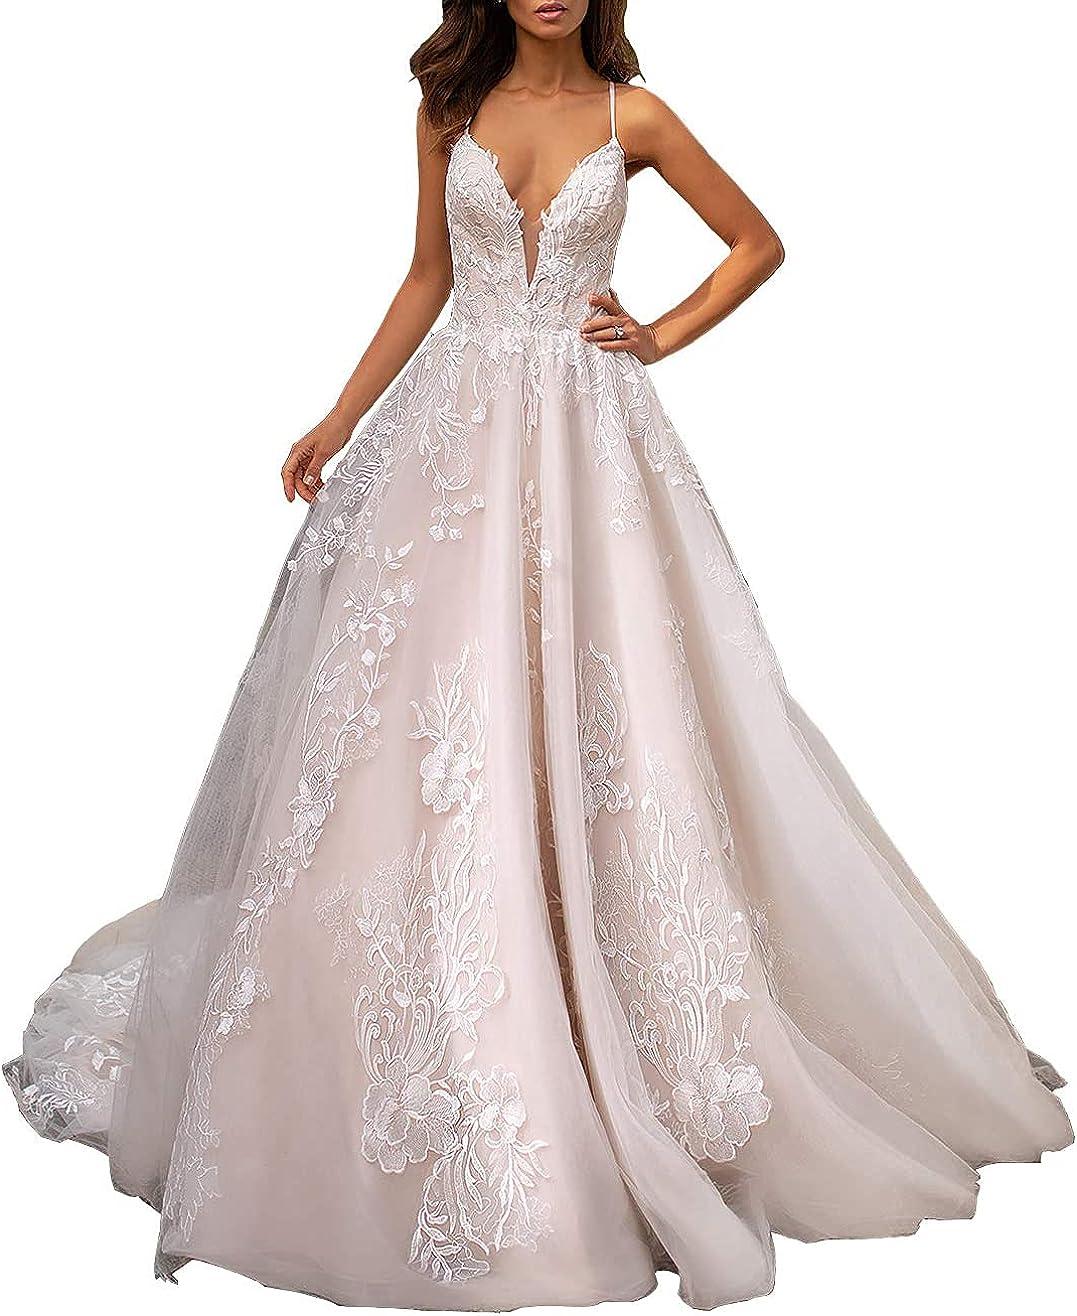 FRECASA Deep V-Neck Wedding Dresses for Bride Spaghetti Ball Gown A-Line Tulle...